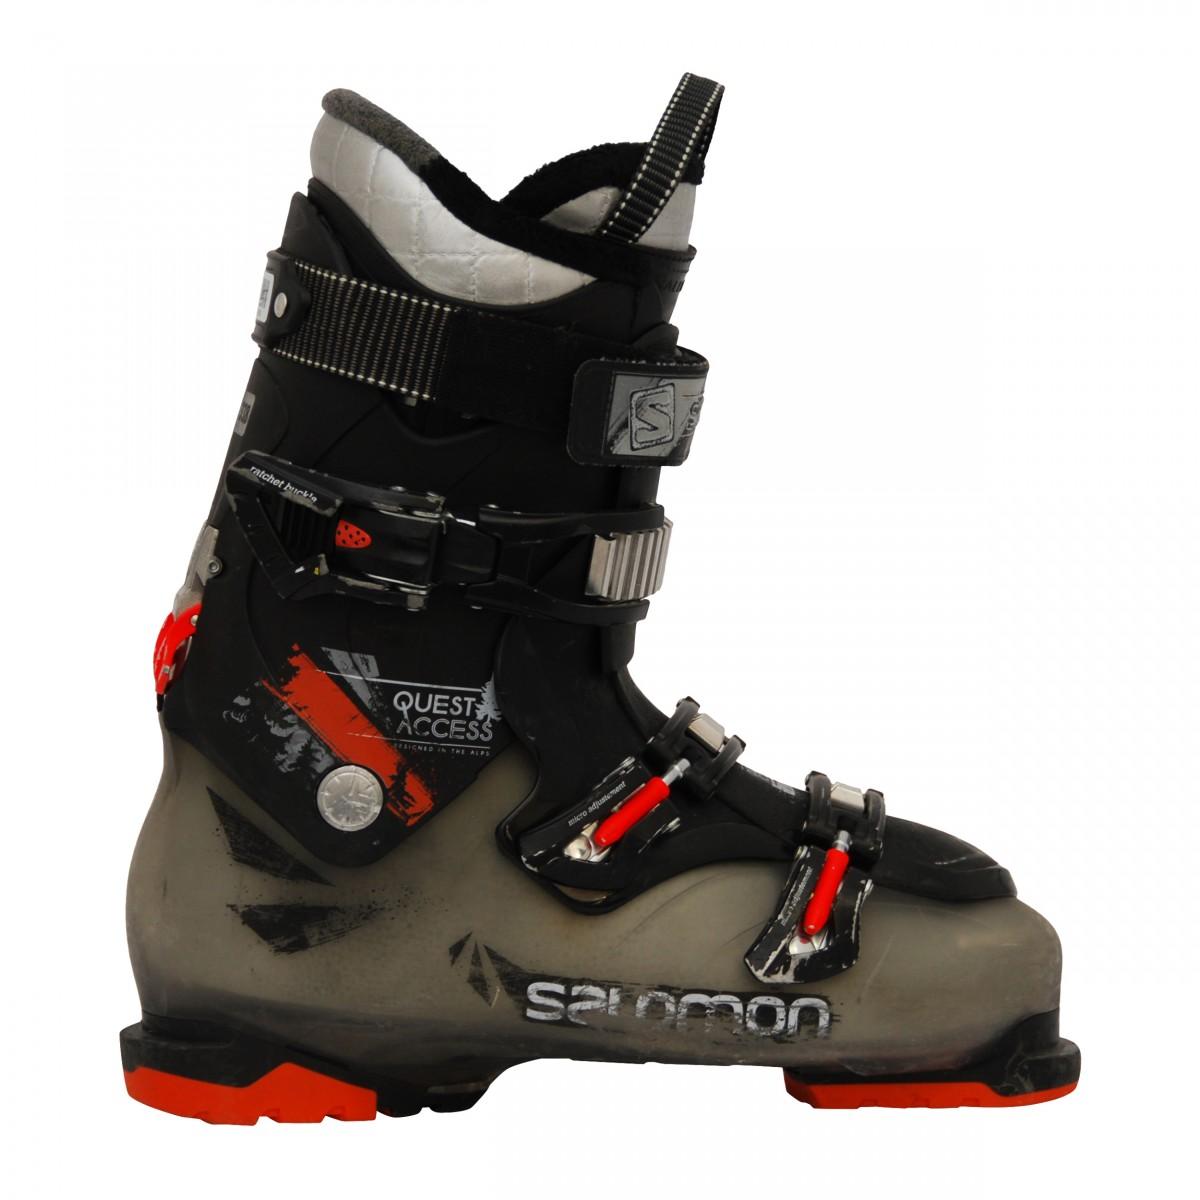 chaussures ski salomon equipe,chaussures salomon quest